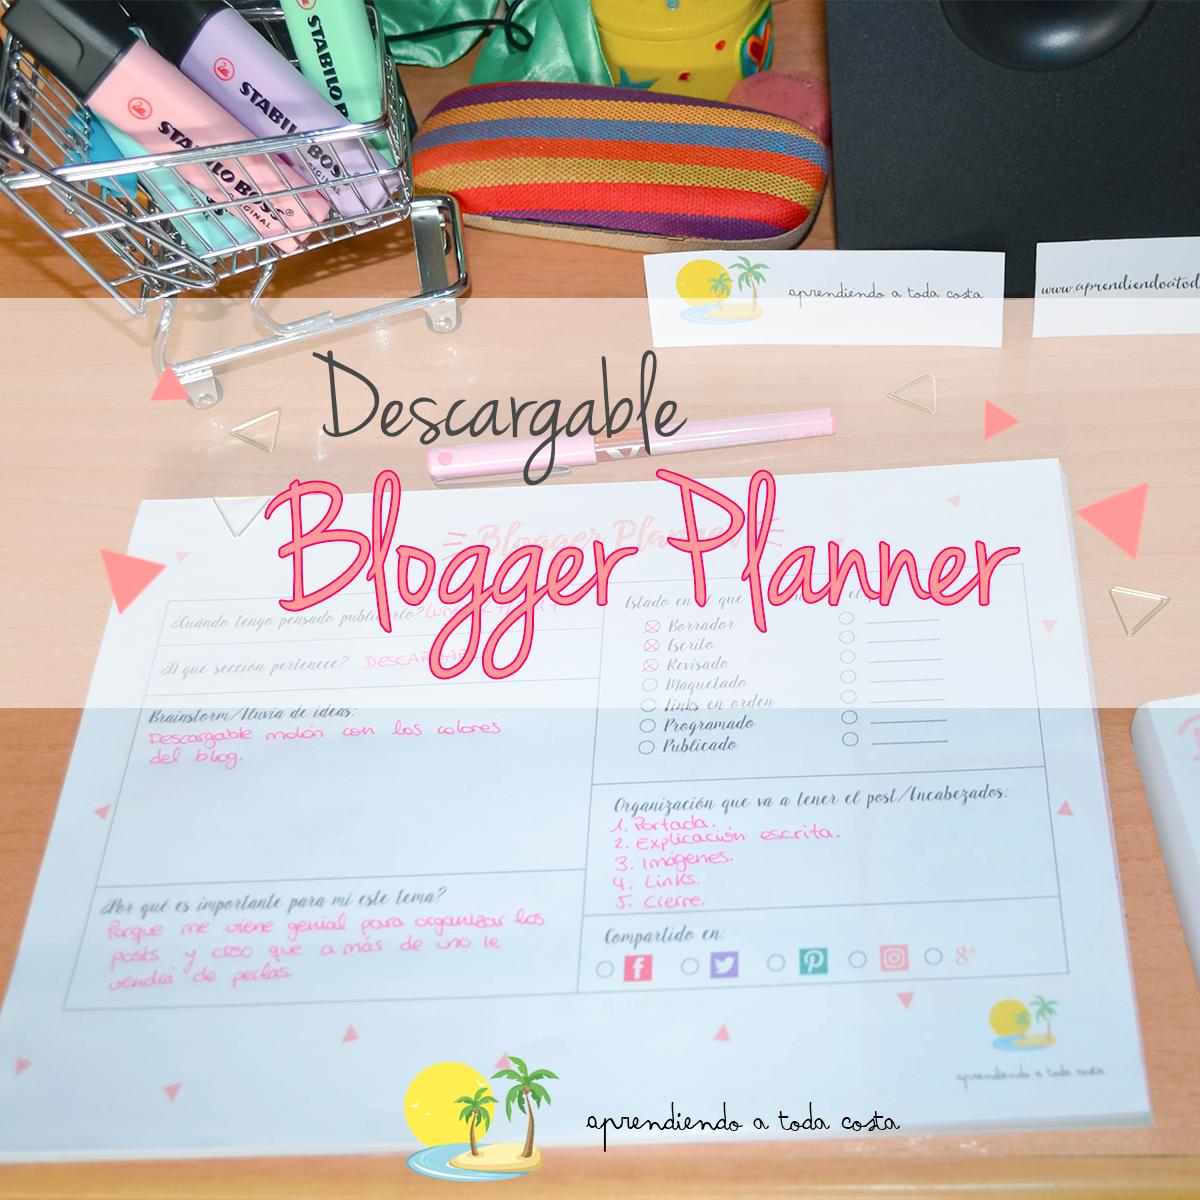 Blogger Planner descargable